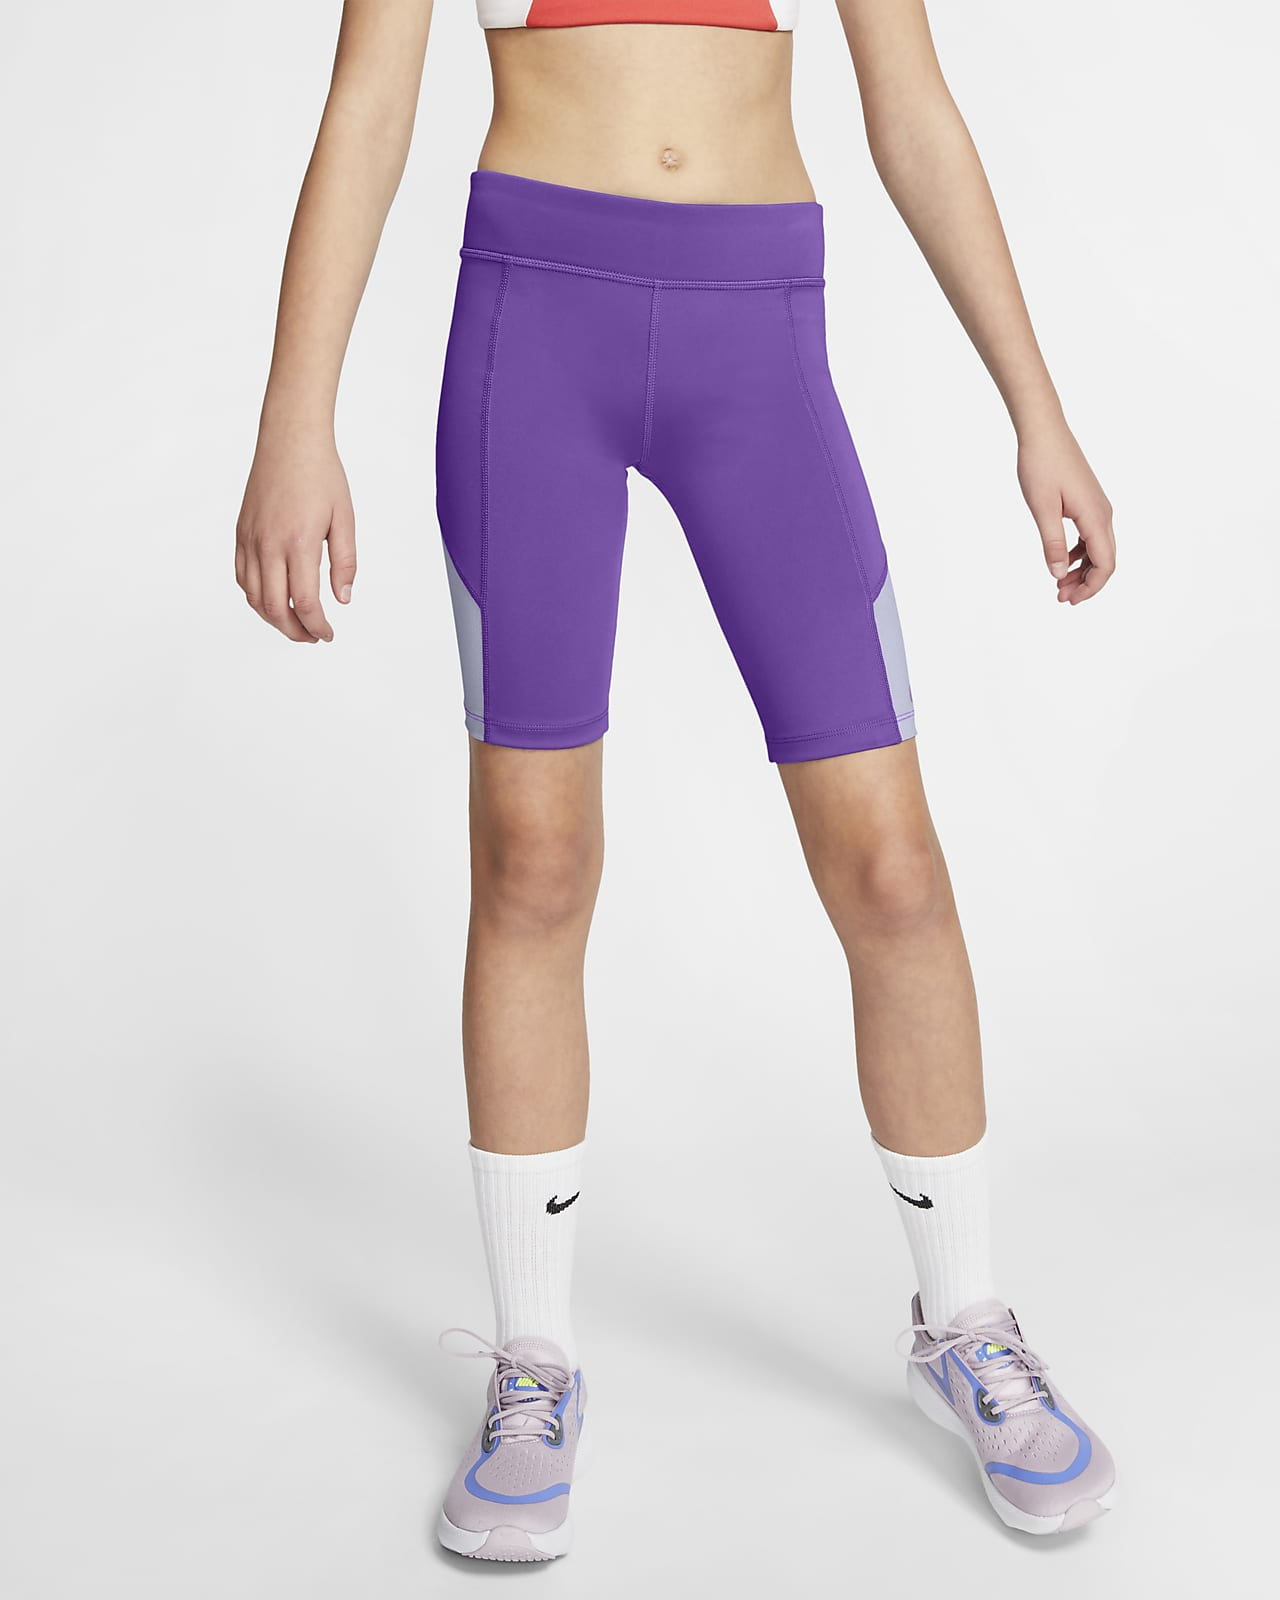 Nike Trophy Big Kids' (Girls') Training Bike Shorts